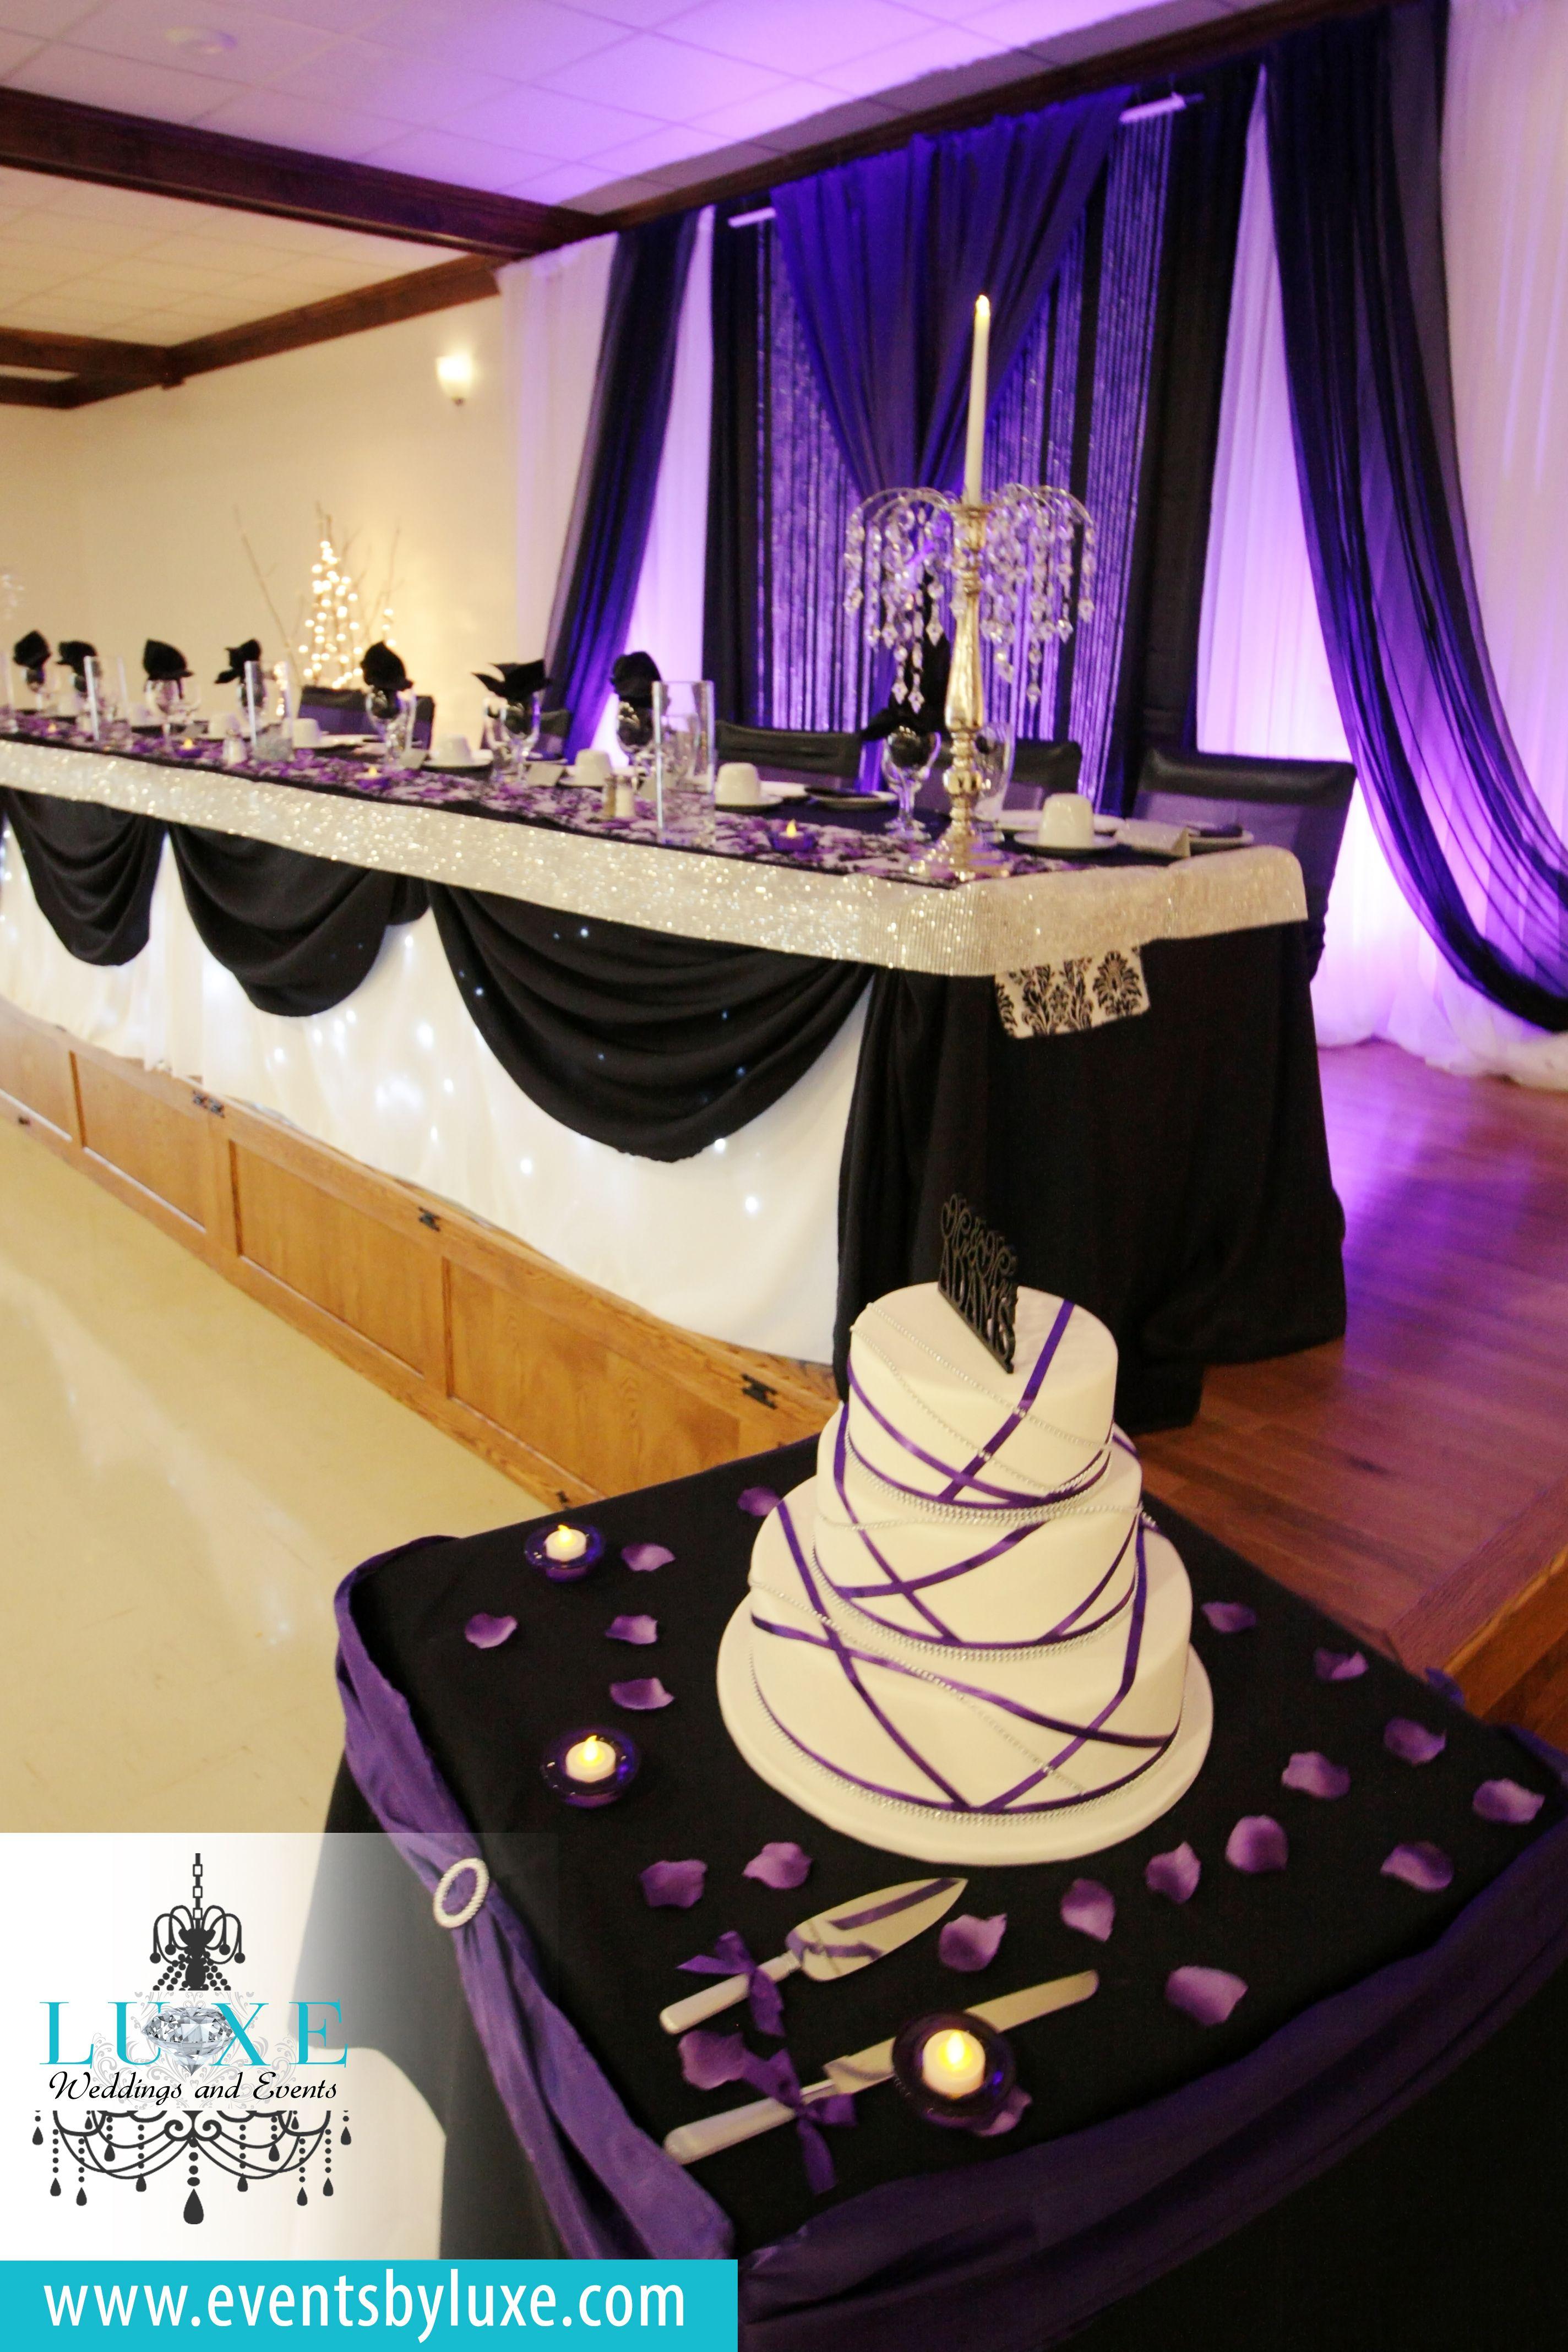 Purple black and white wedding backdrop,purple uplighting